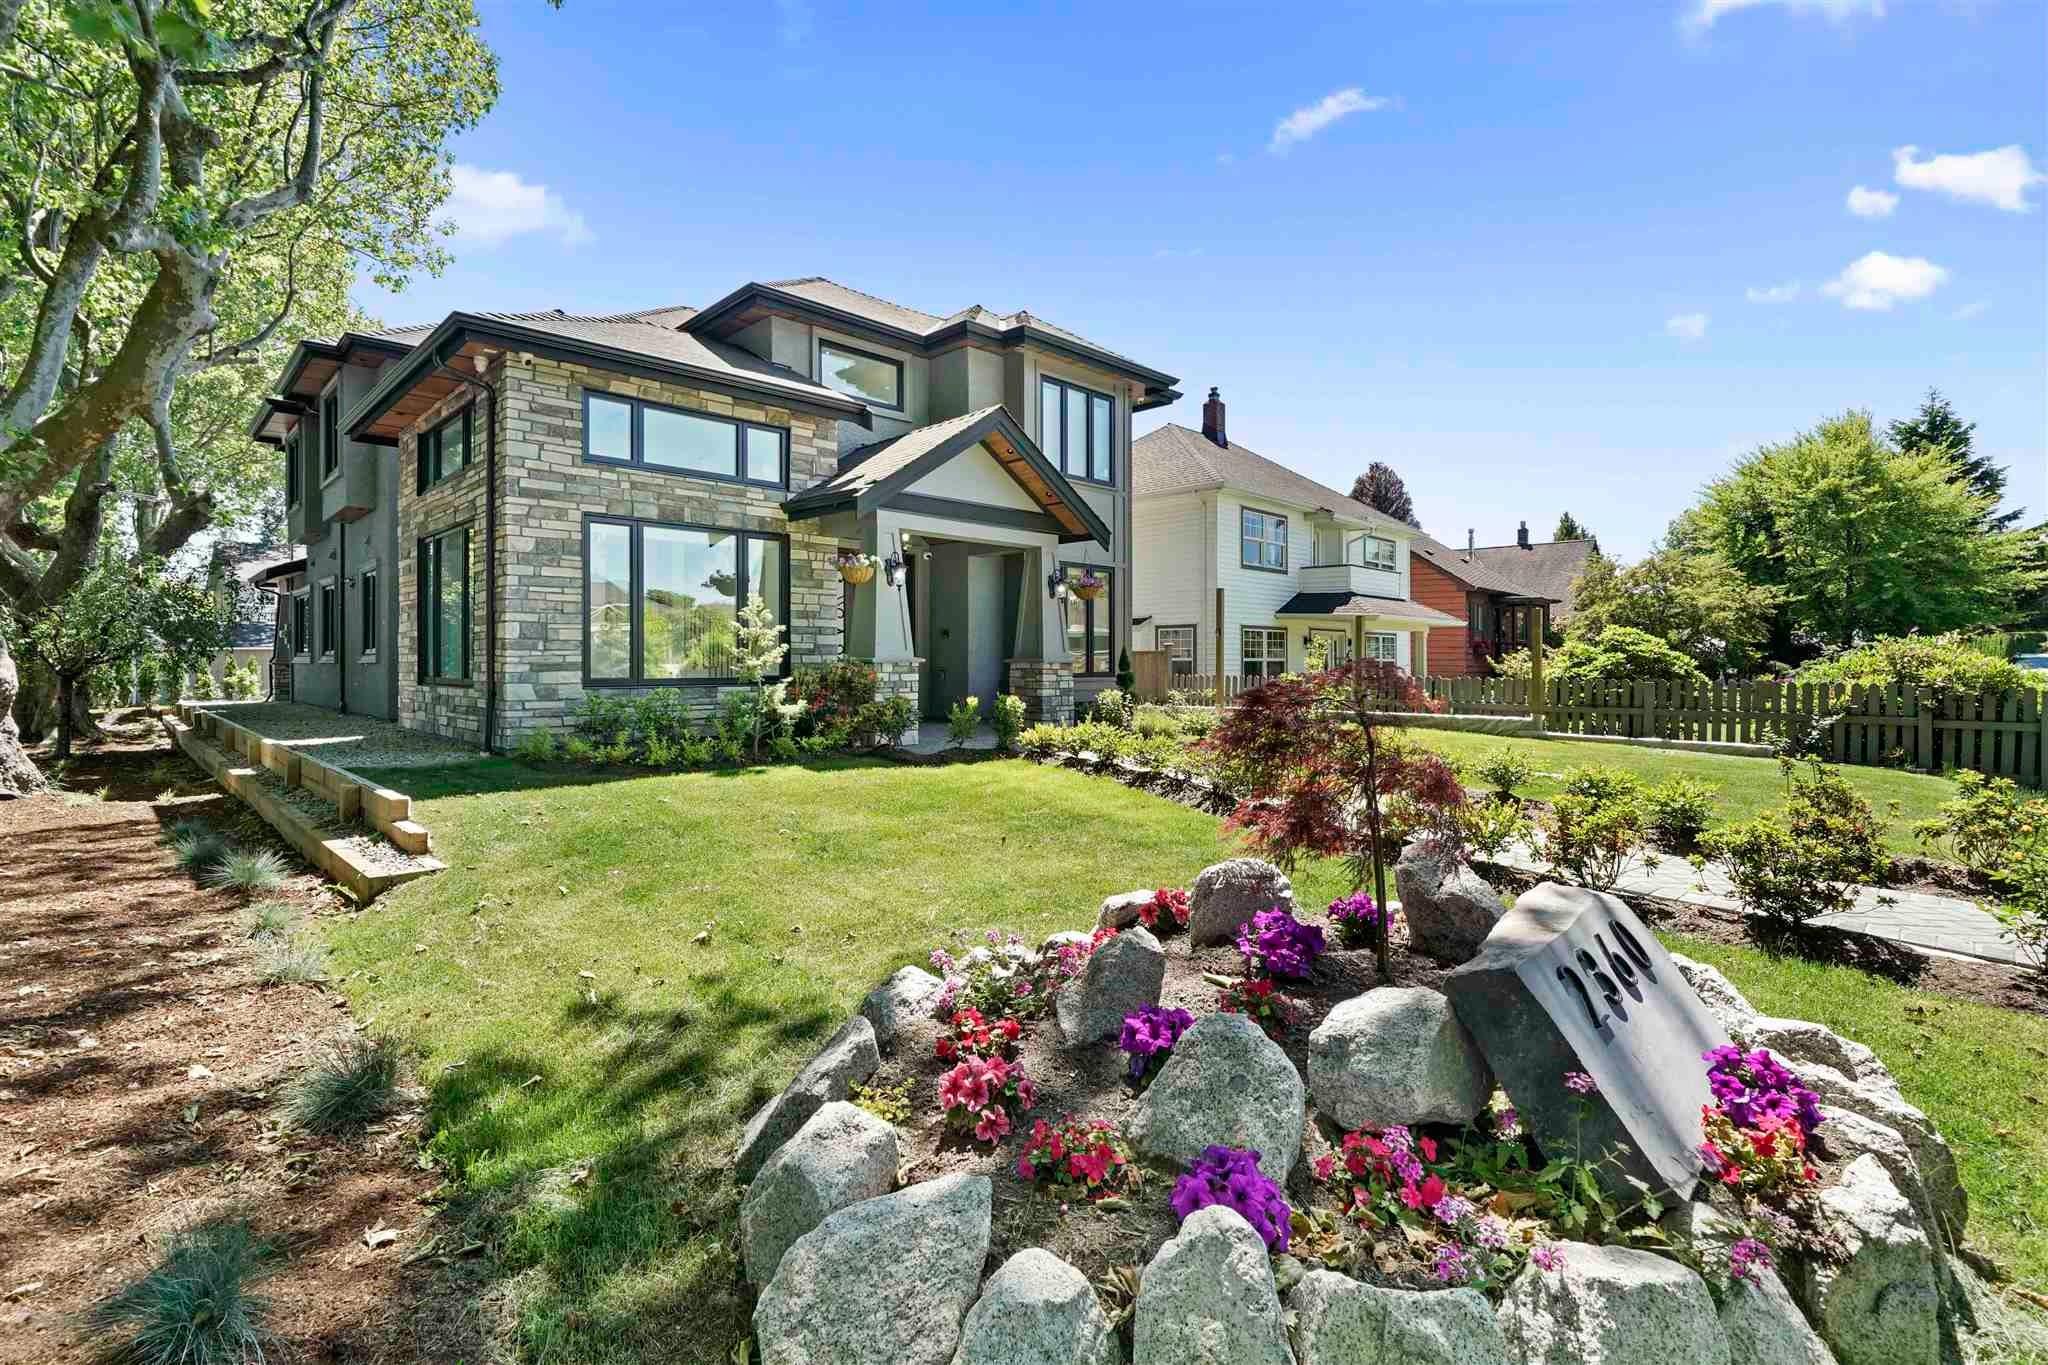 2360 DOUGLAS CRESCENT - Sea Island House/Single Family for sale, 5 Bedrooms (R2602865)